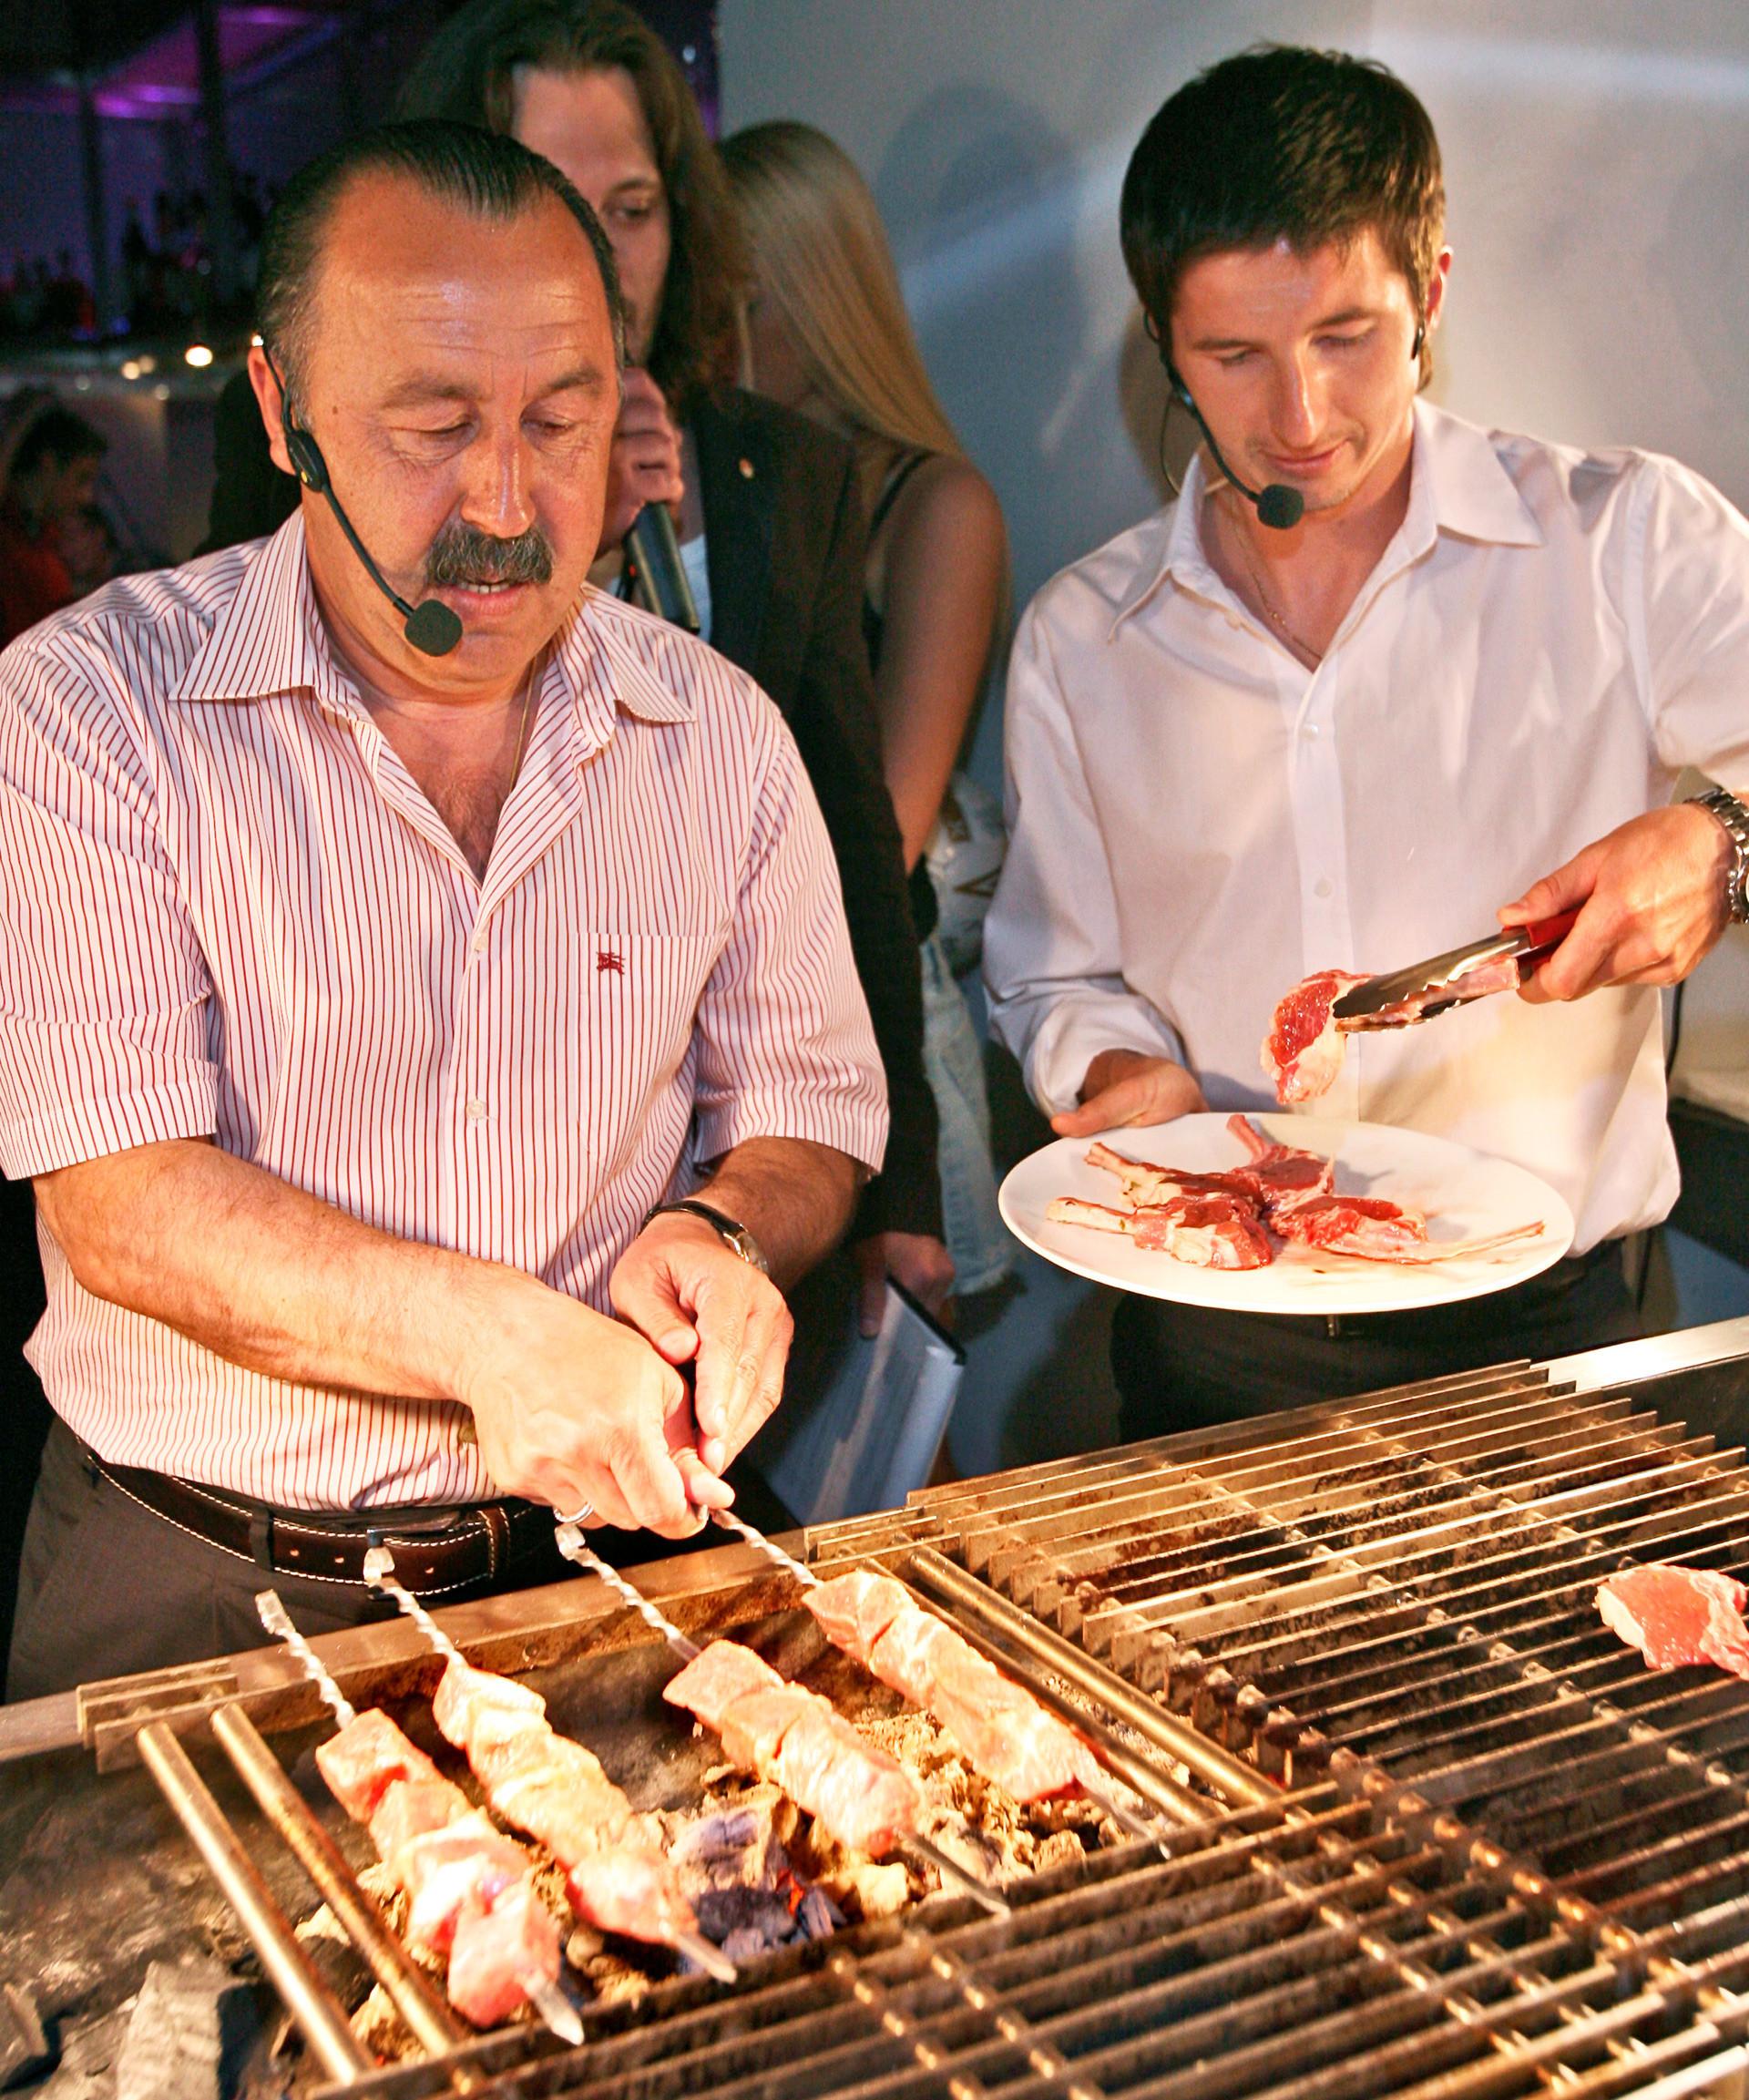 Pelatih dan gelandang CSKA memanggang daging di sebuah restoran di Moskow.